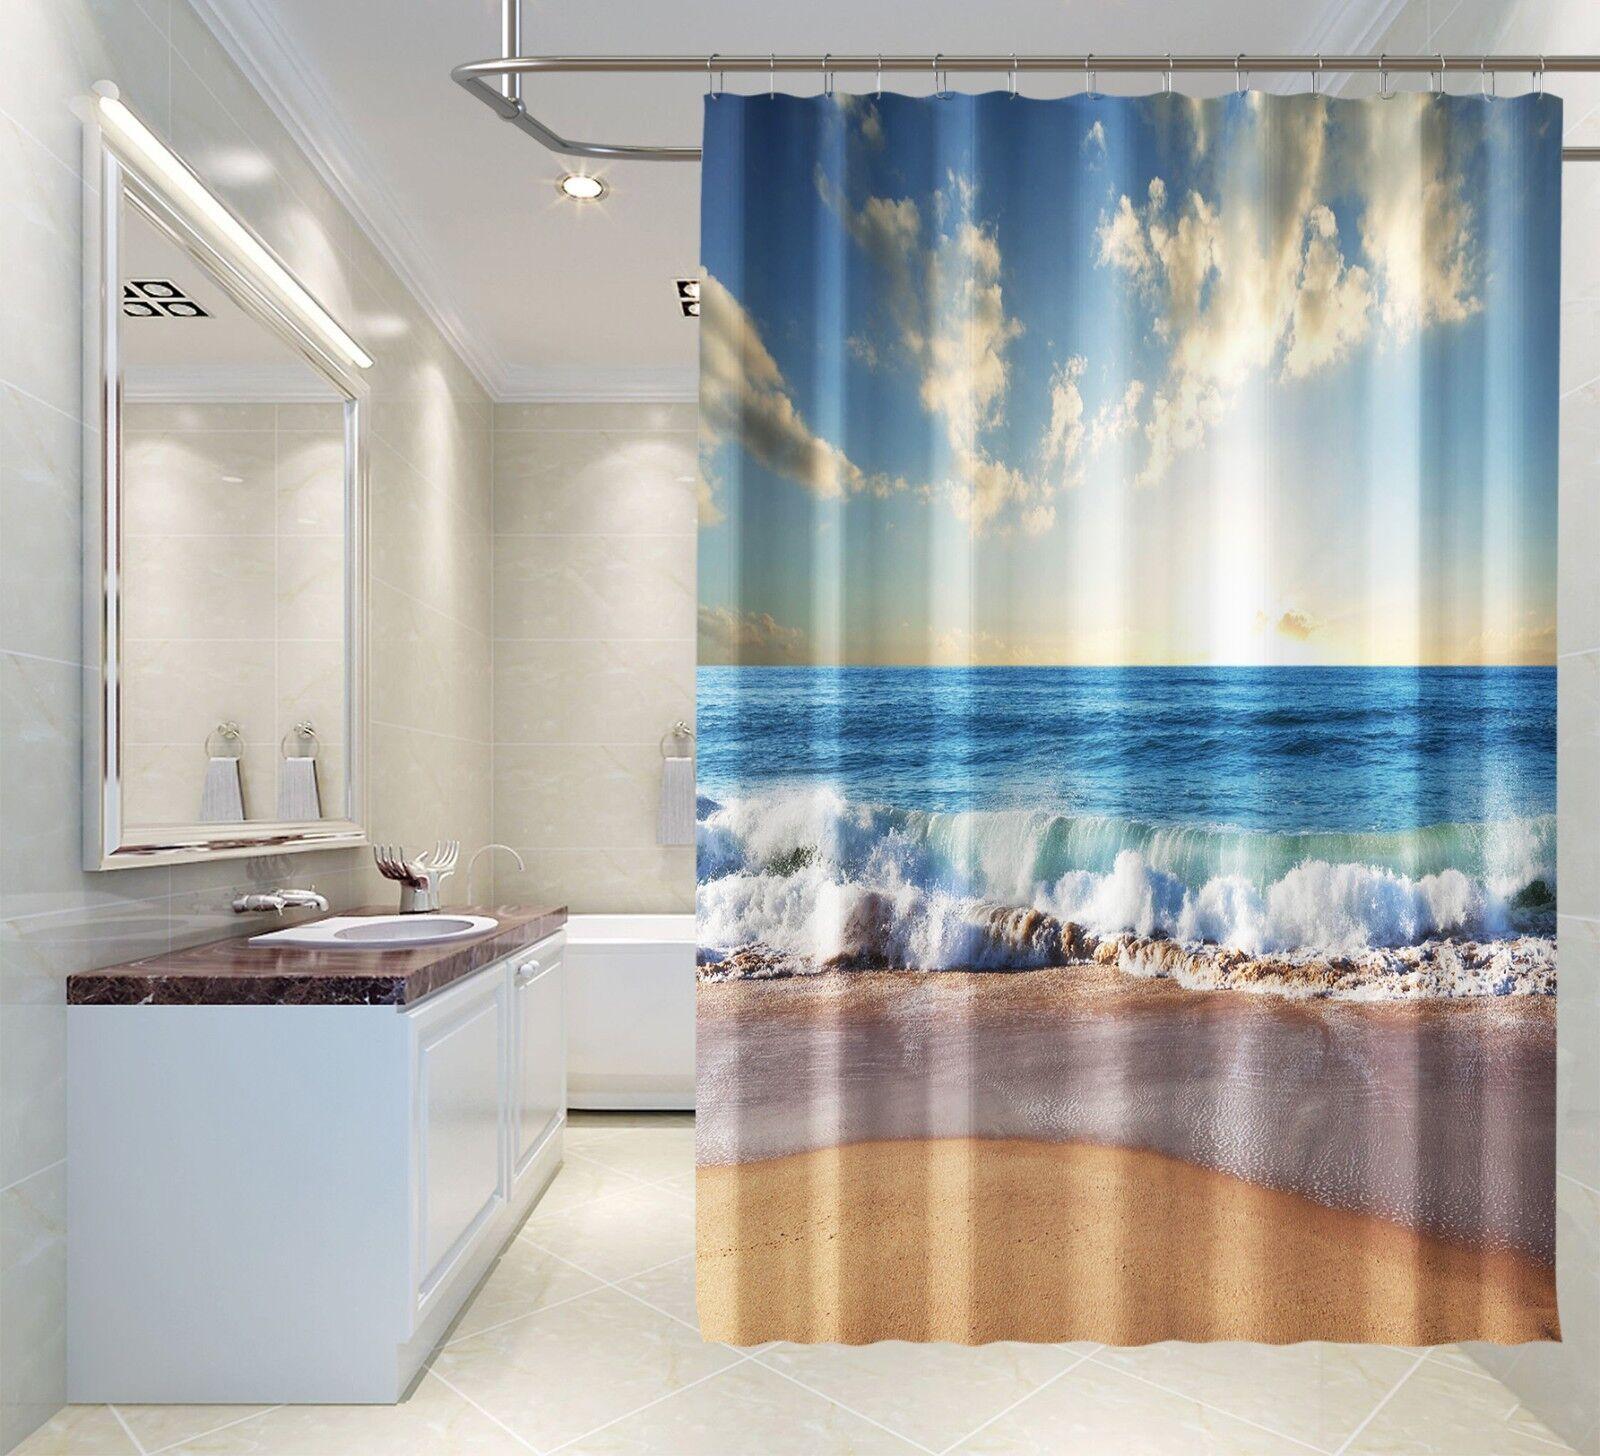 3d playa cielo 3 cortina de ducha impermeable fibra baño en casa Windows inodoro de